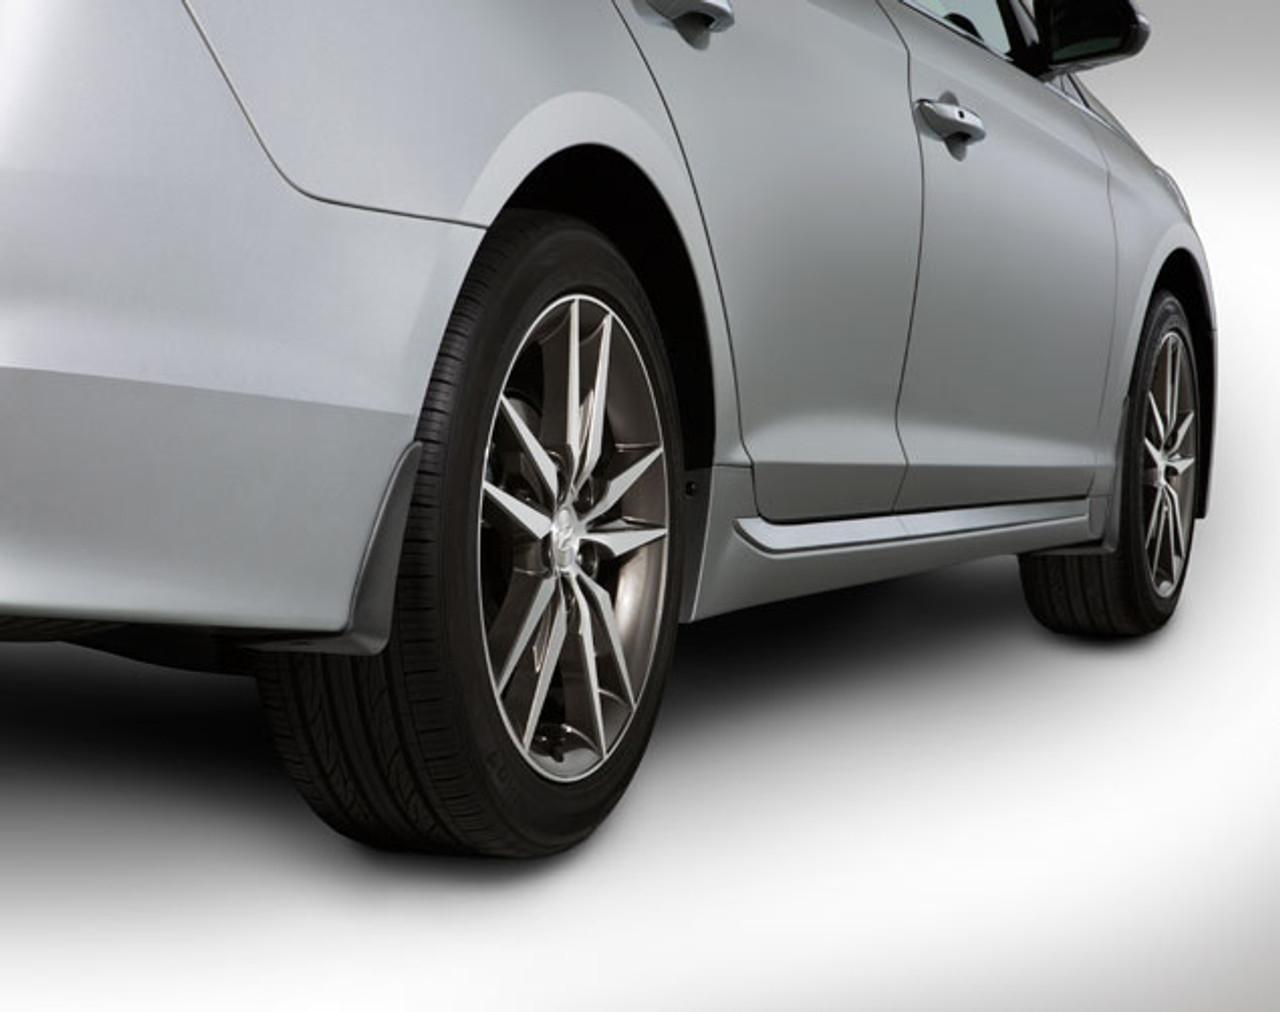 Hyundai Sonata Mud Guards